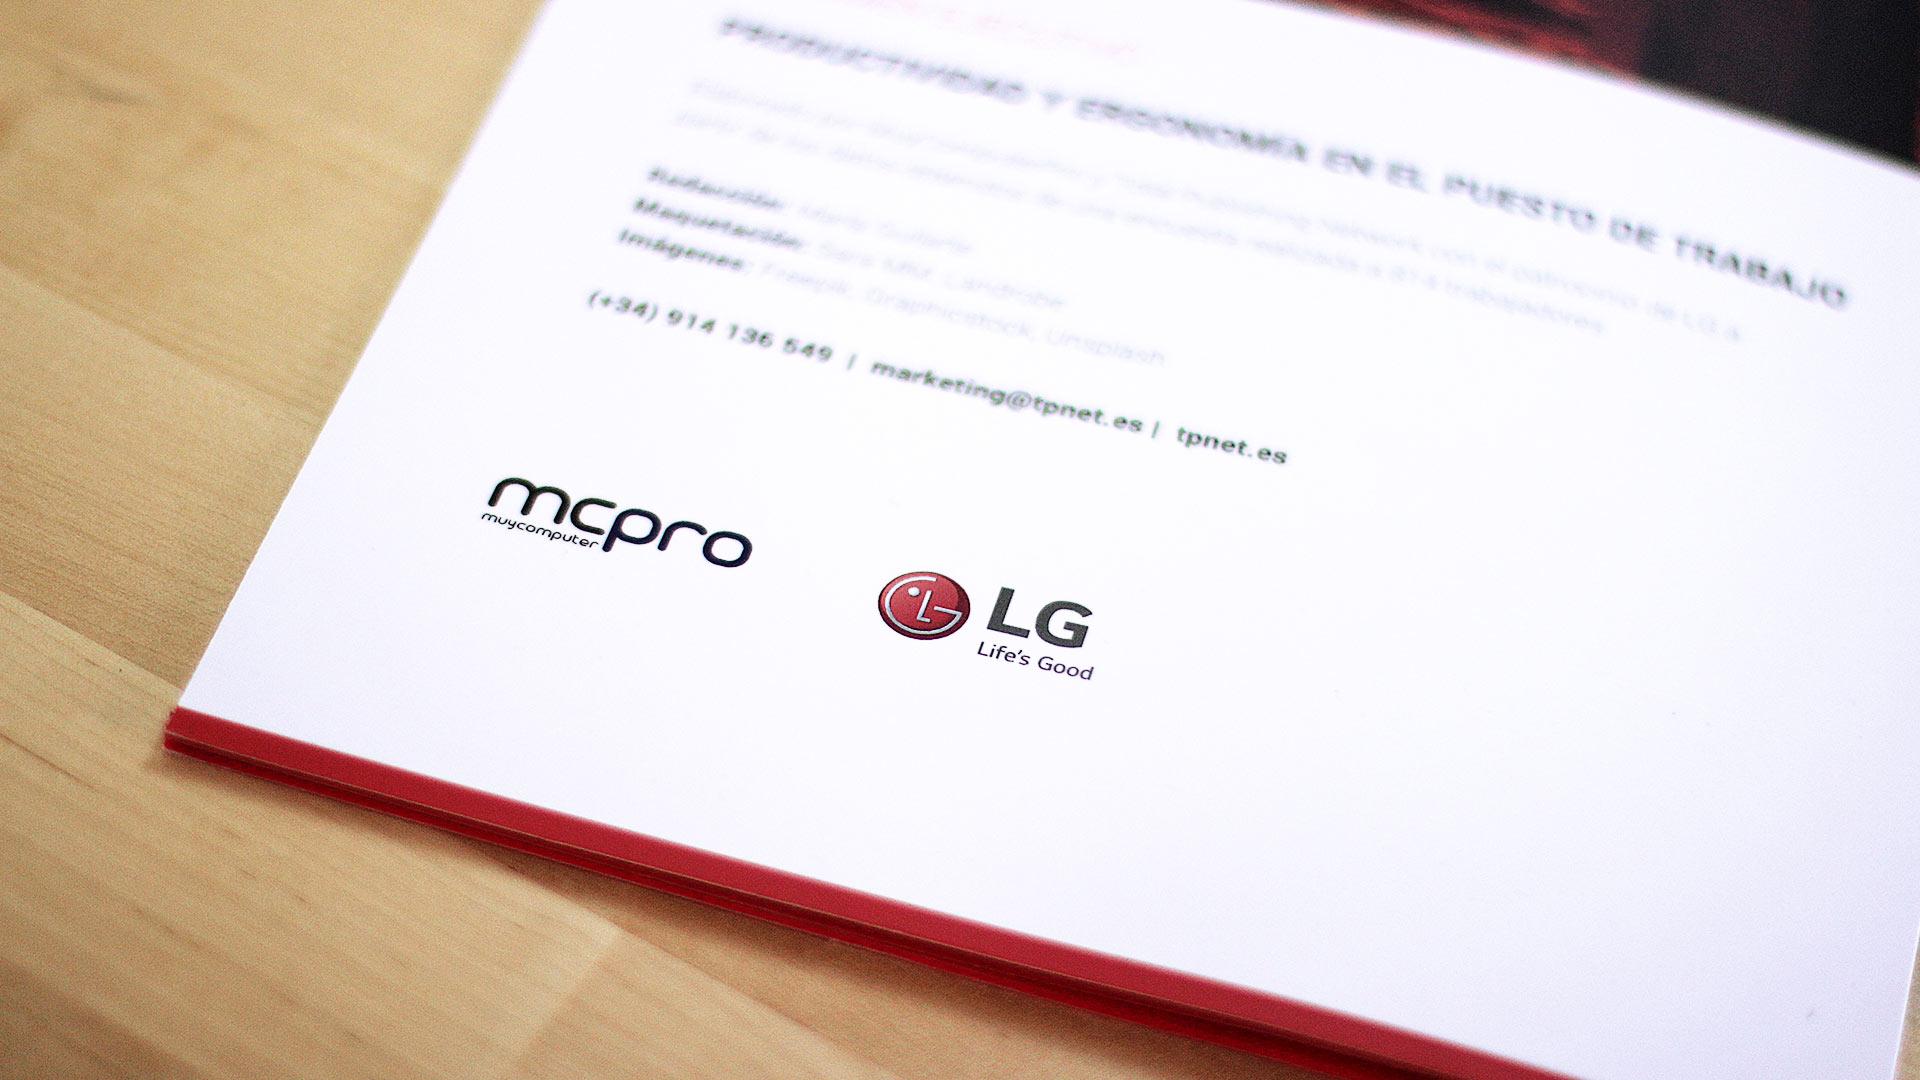 LG--content-marketing-informe-resumen-ejecutivo-ebook-ergonomia--2017_06